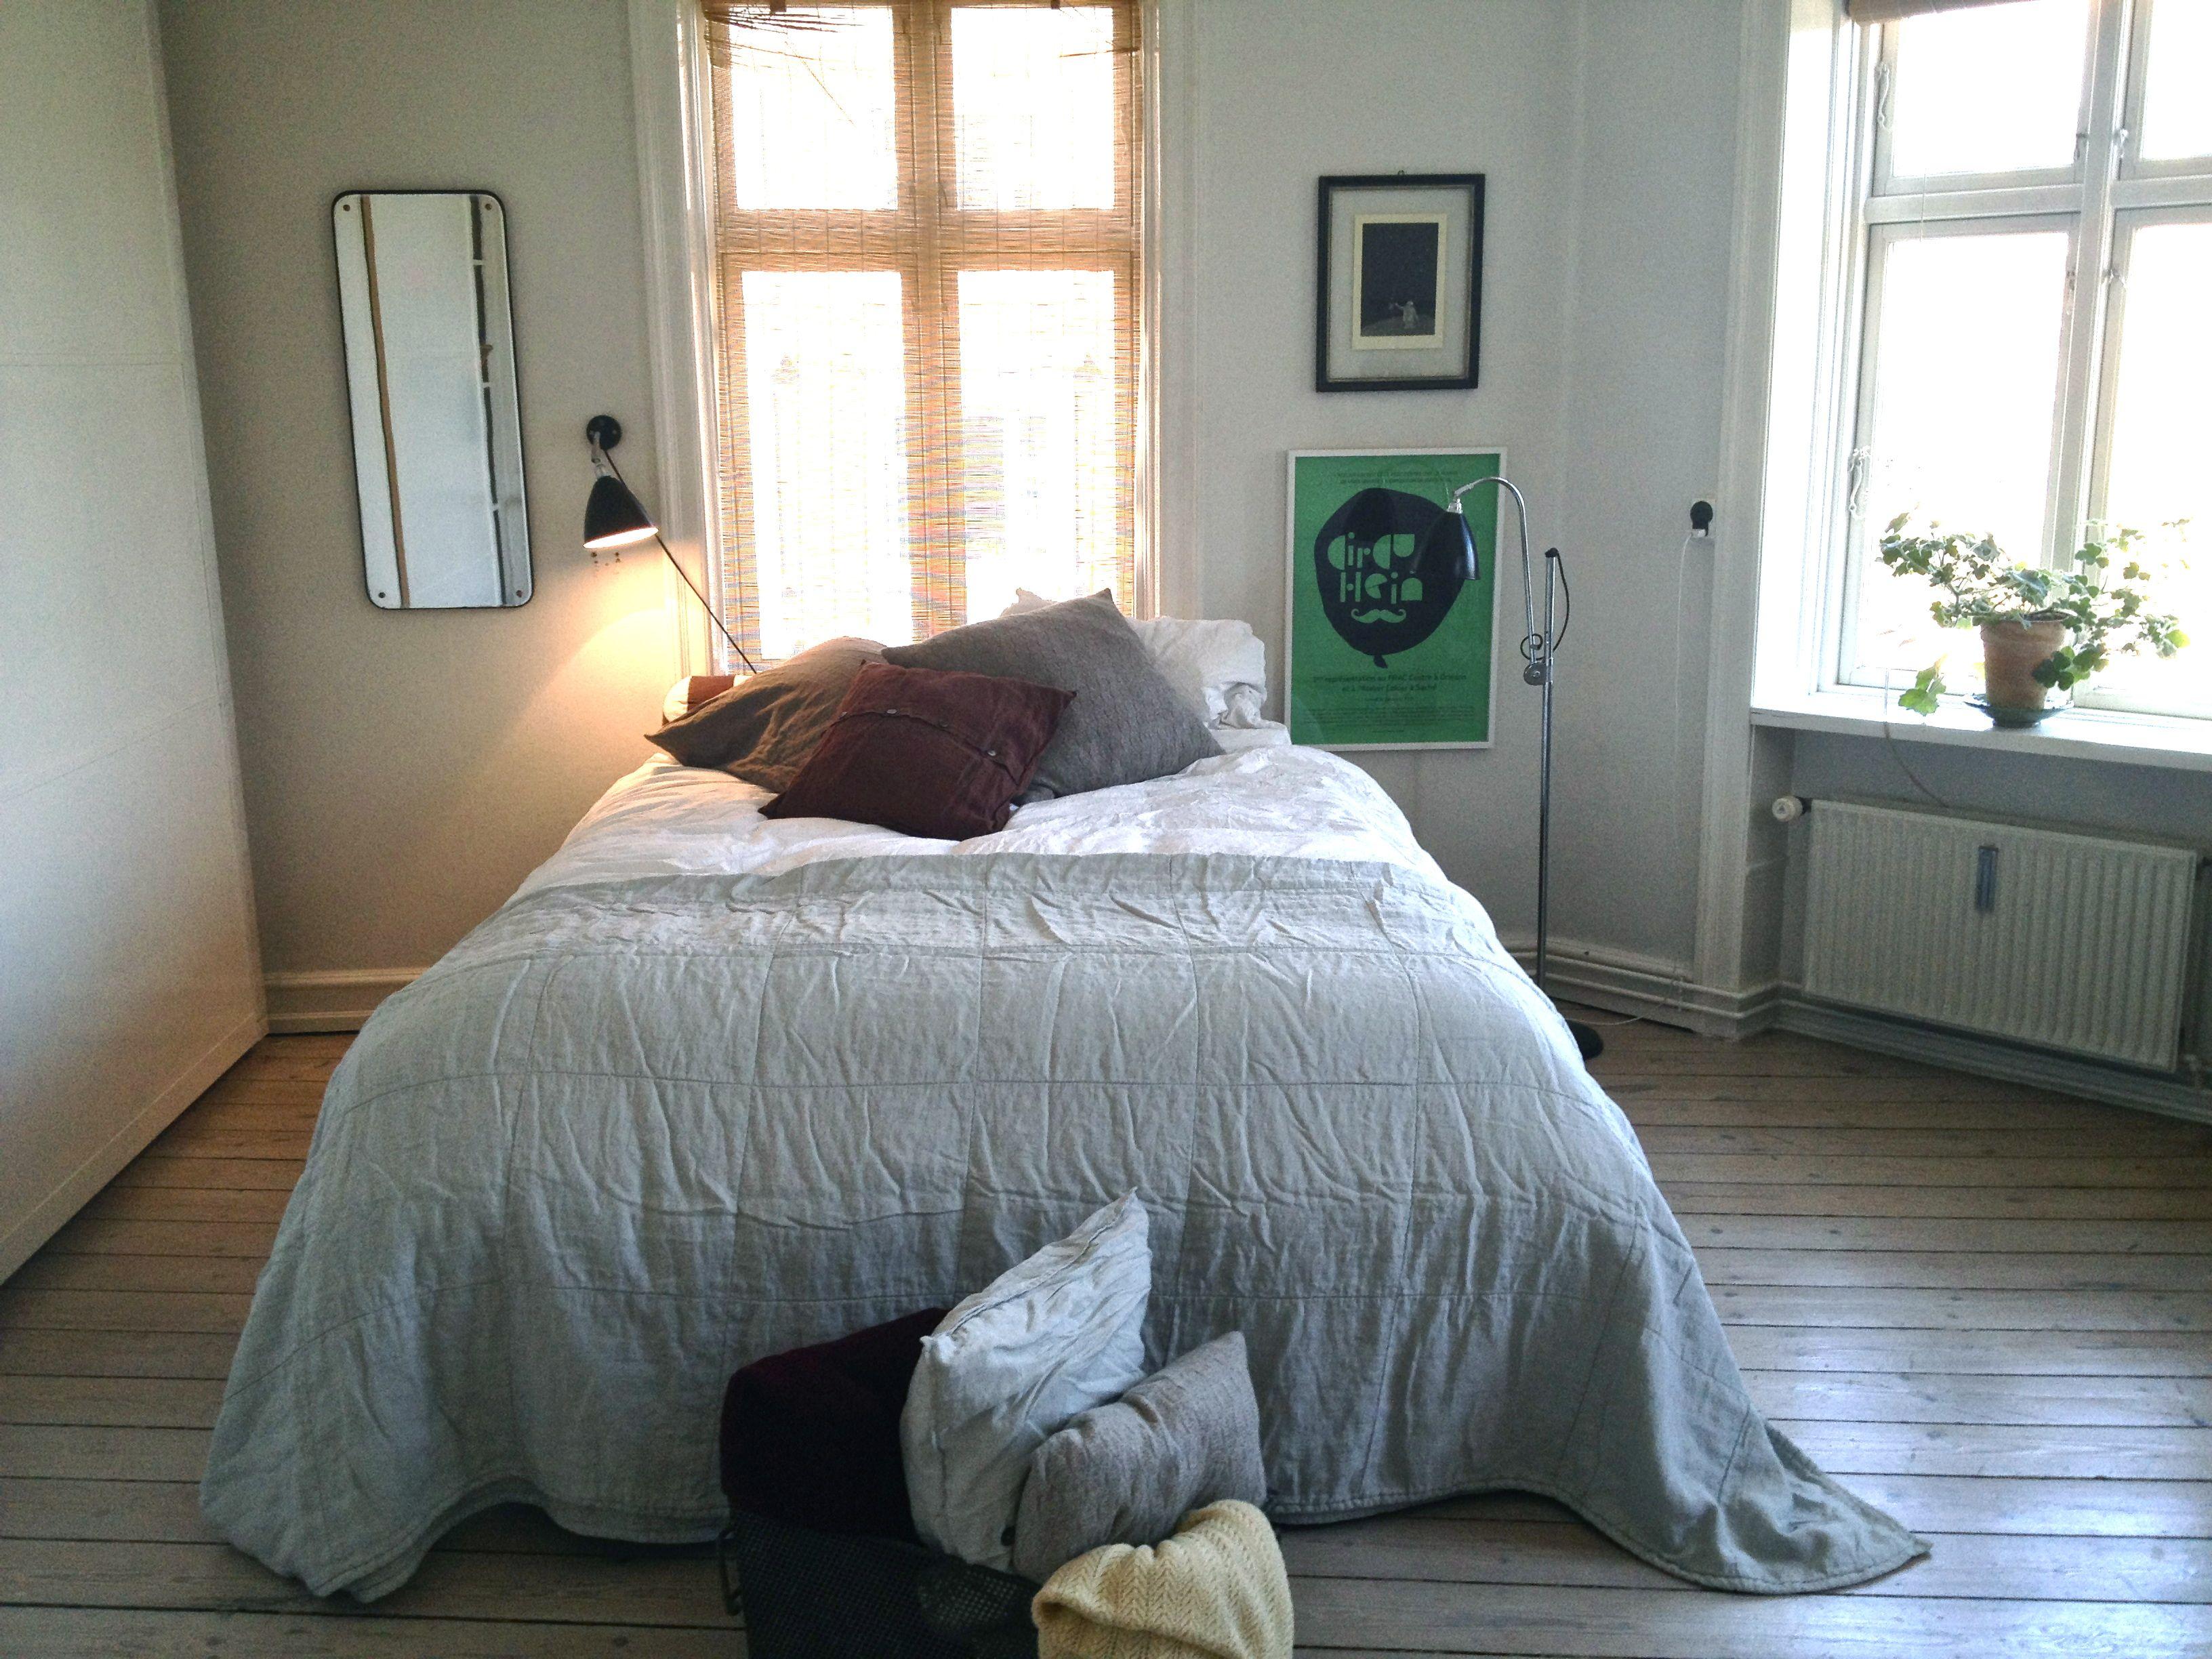 minimal bedrooms decorate ideas for room bed design decor designs bedroom modern minimalist